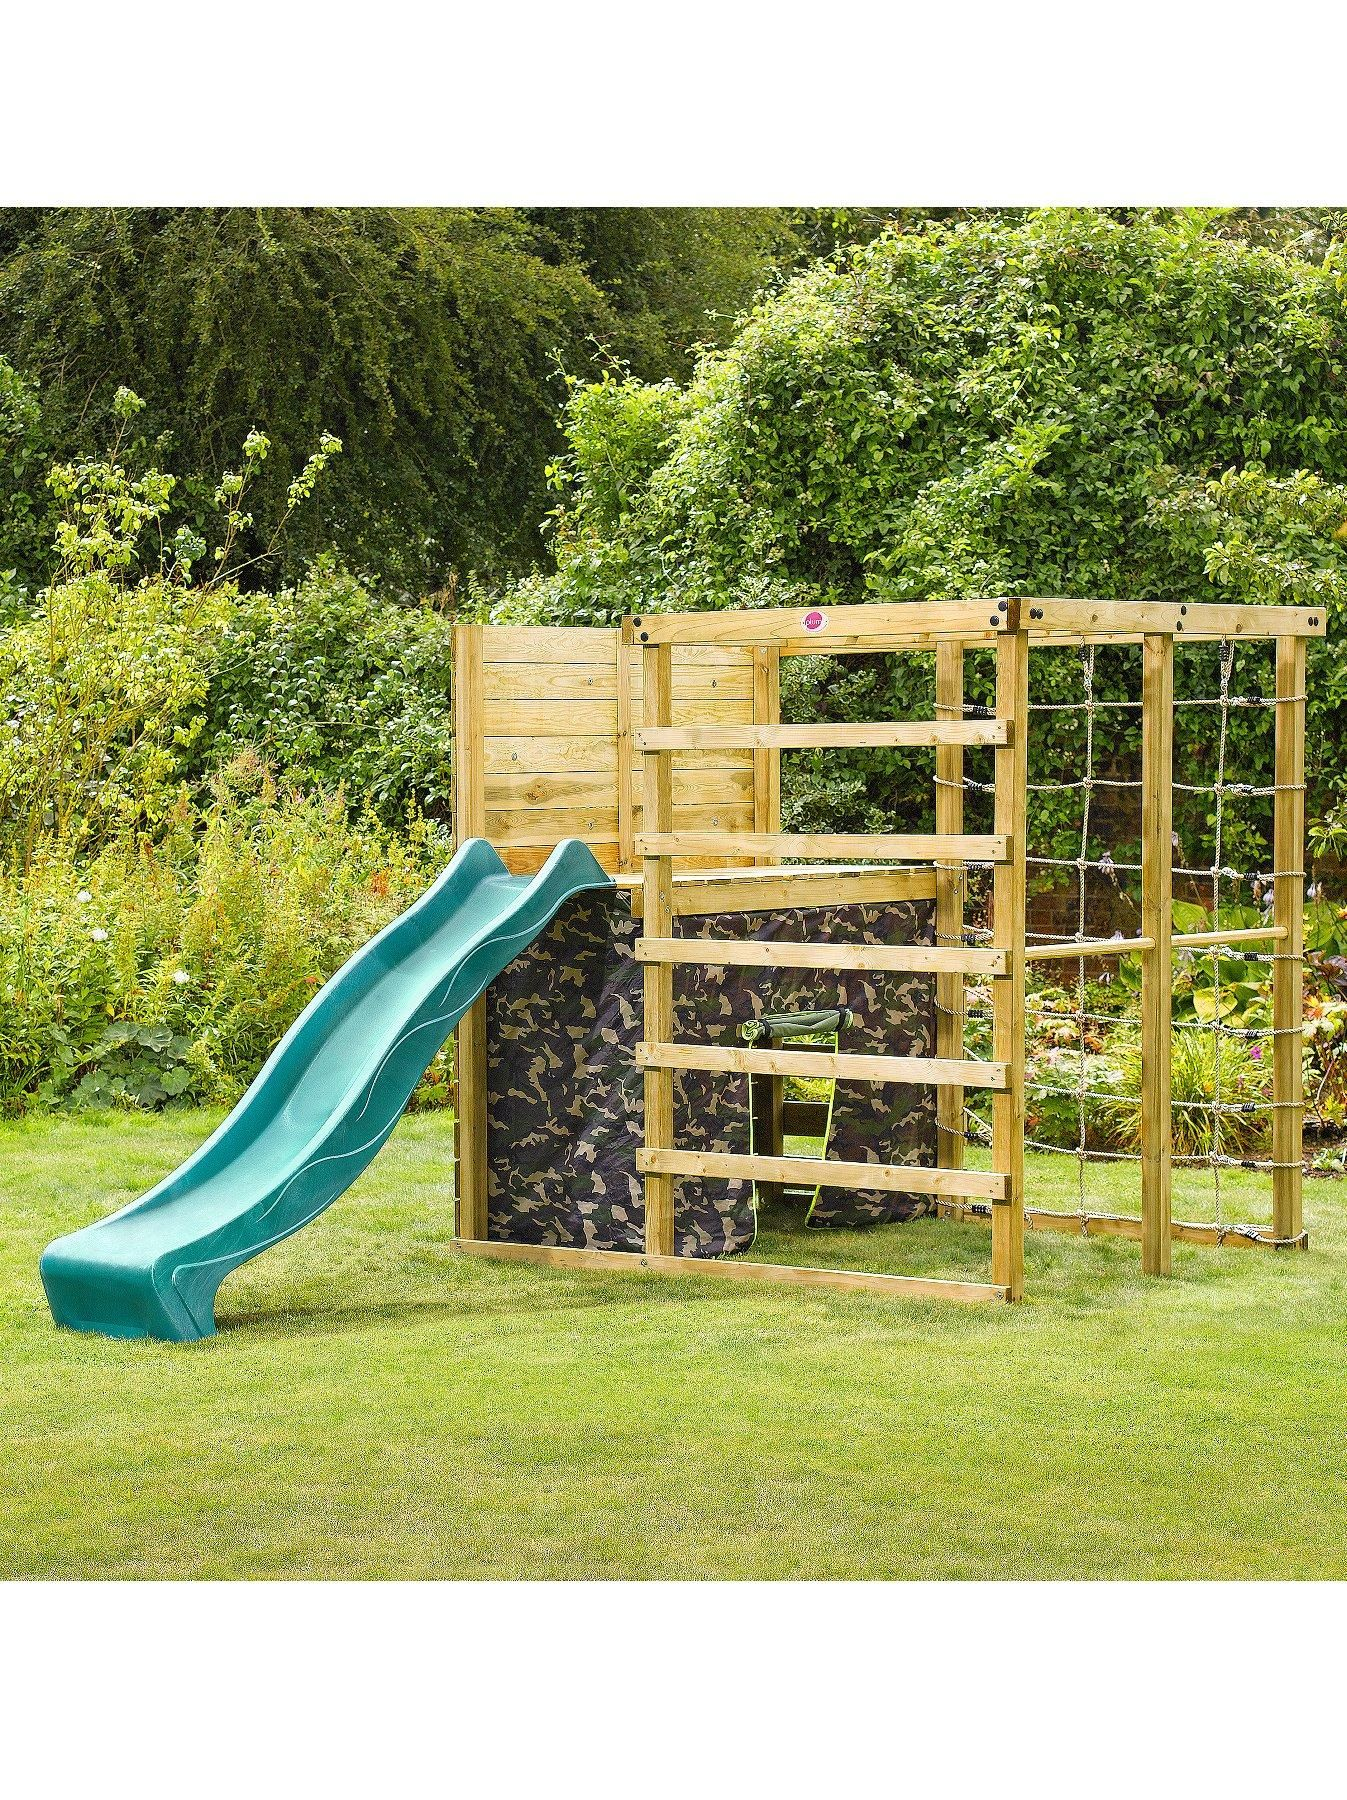 Plum Climbing Cube Wooden Play Centre In 2019 Zahrada Pro Děti